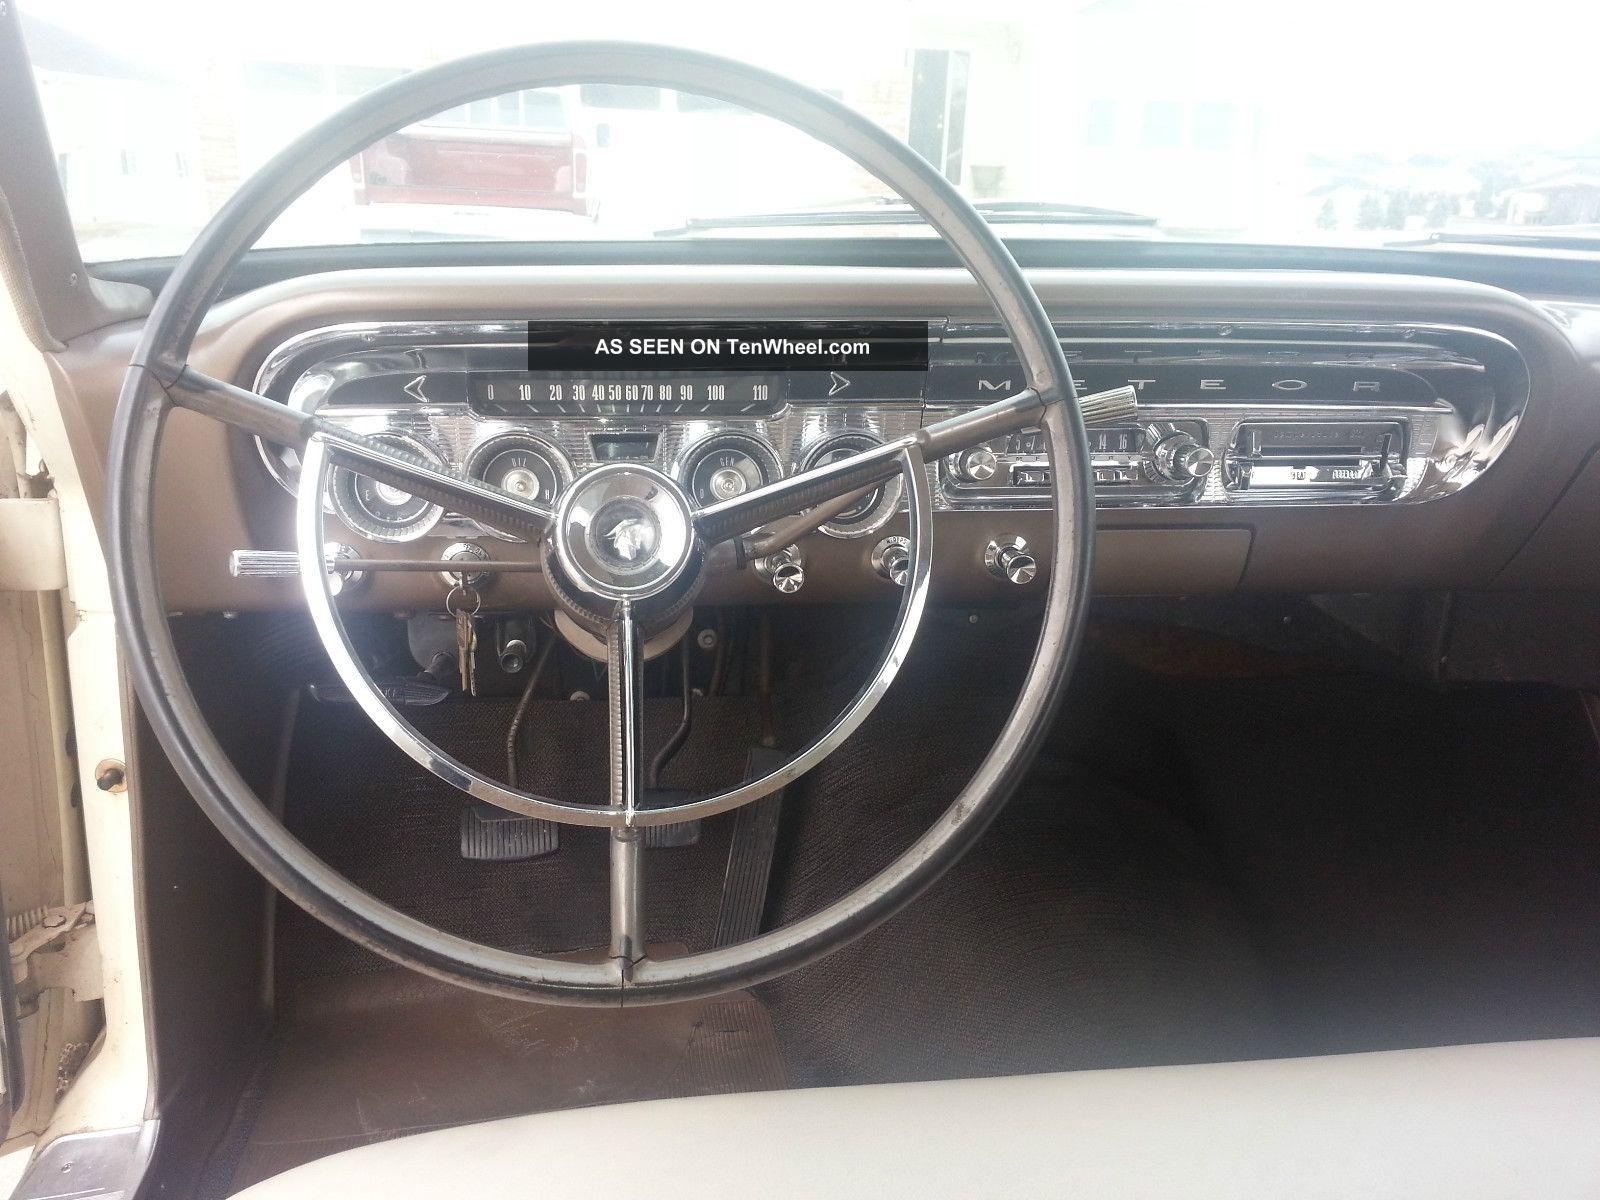 1963 Mercury Meteor Wagon - Ford Fairlane Wagon, Galaxie